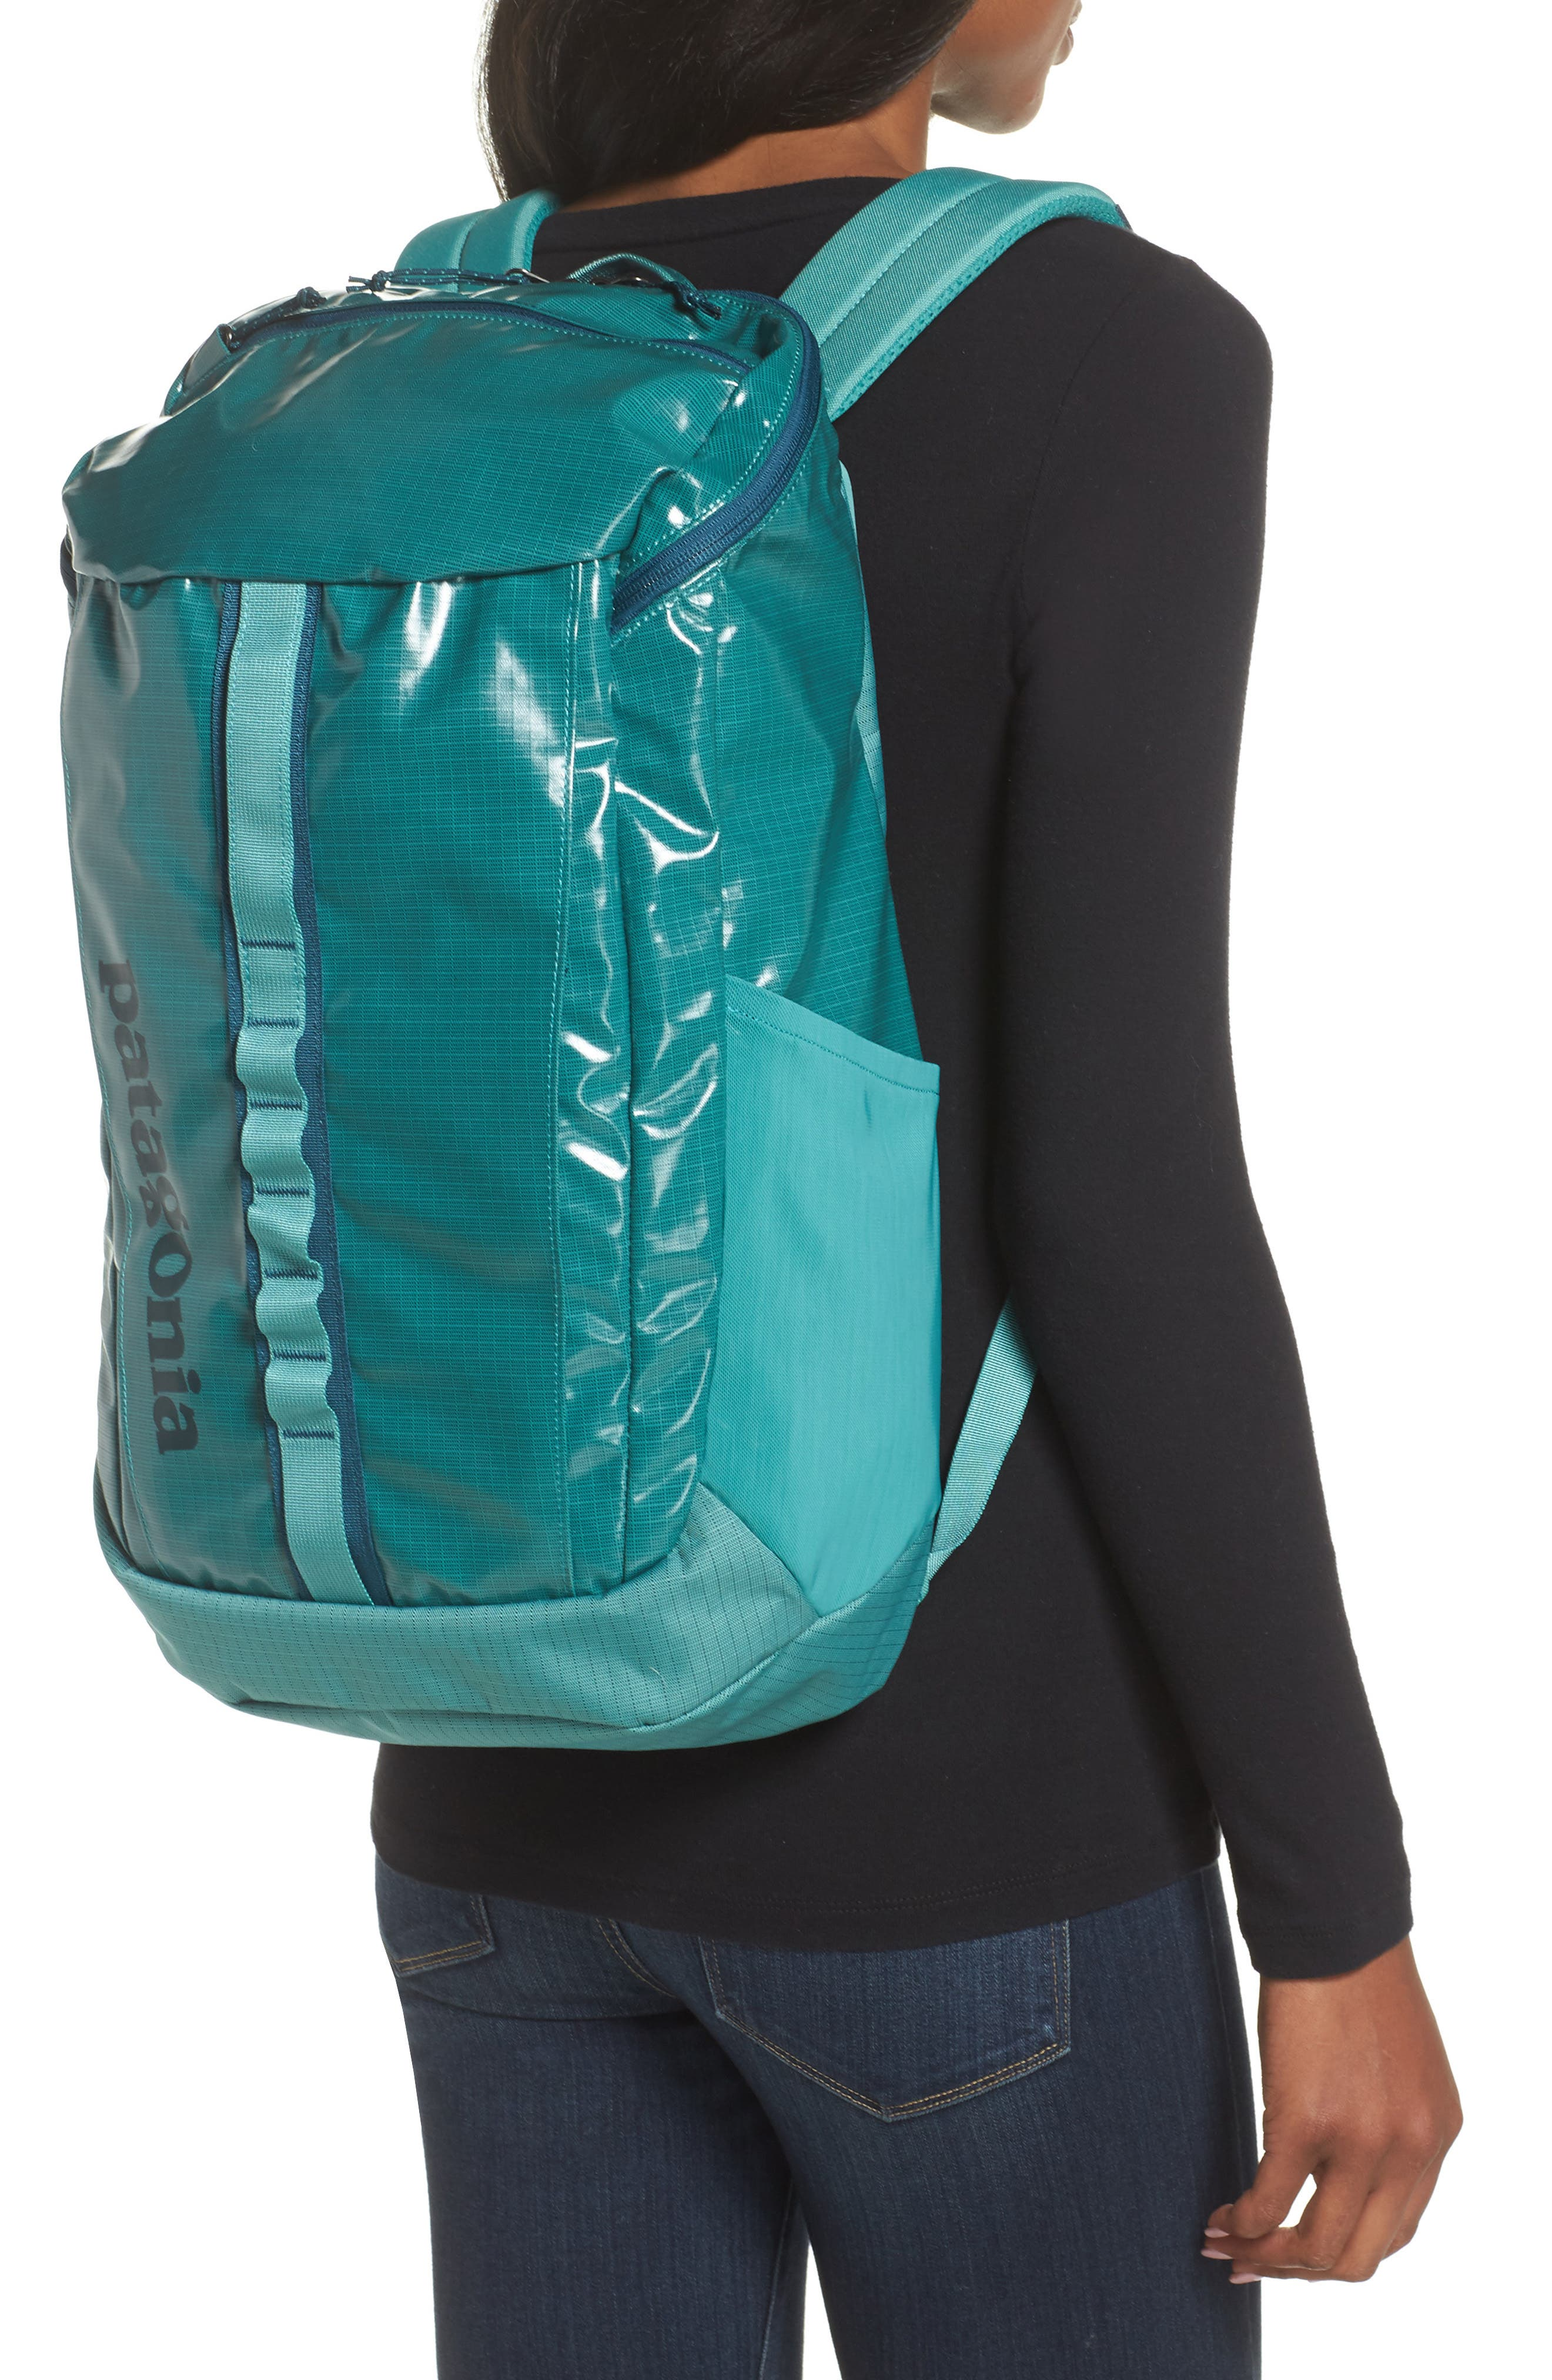 Black Hole 25L Backpack,                             Alternate thumbnail 2, color,                             Beryl Green